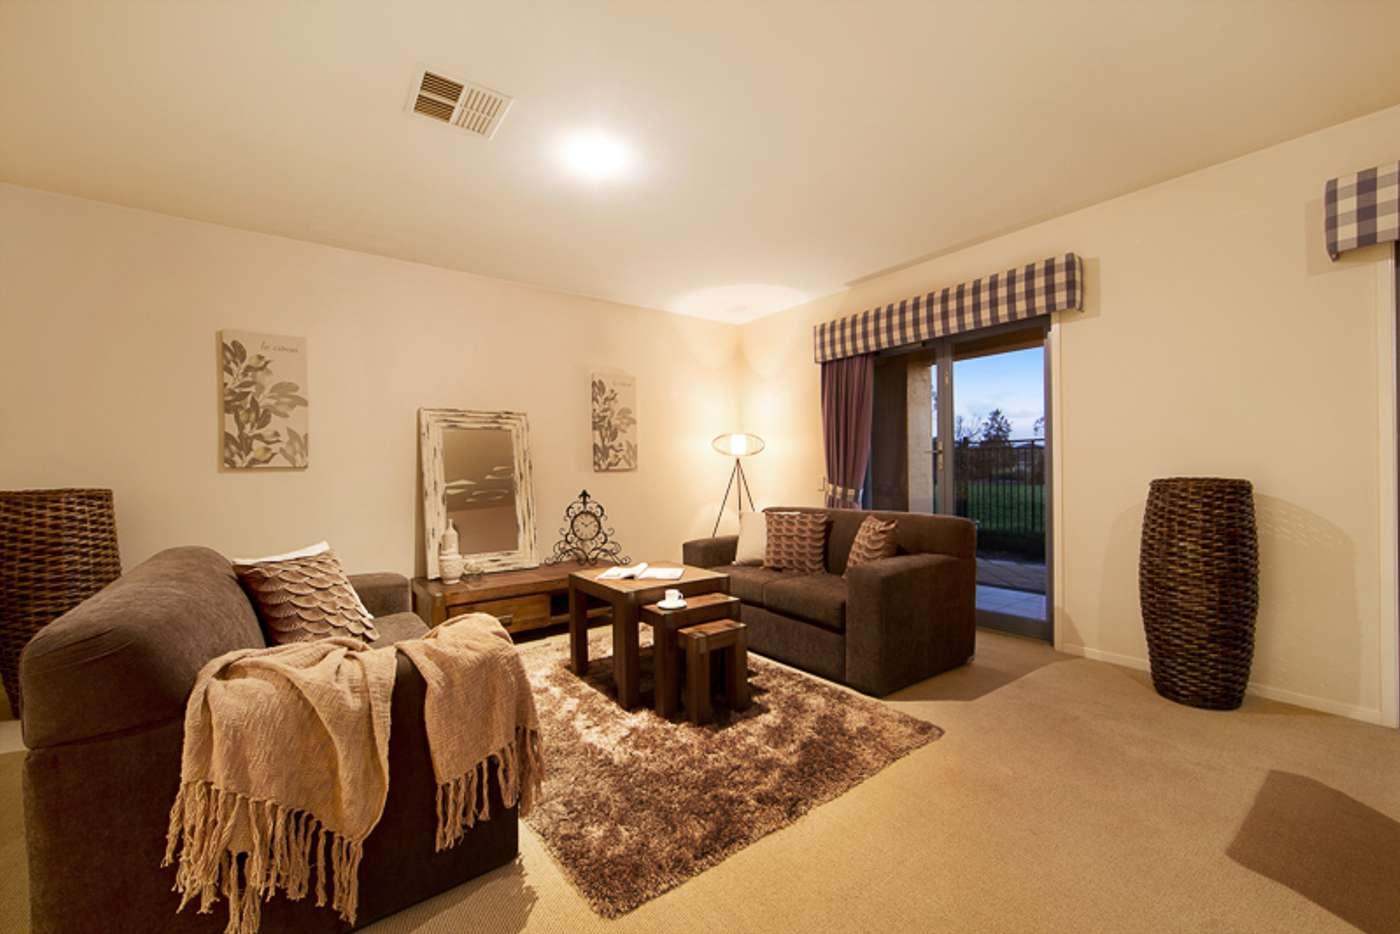 Sixth view of Homely house listing, 19 Lakeside Circuit, Northgate SA 5085